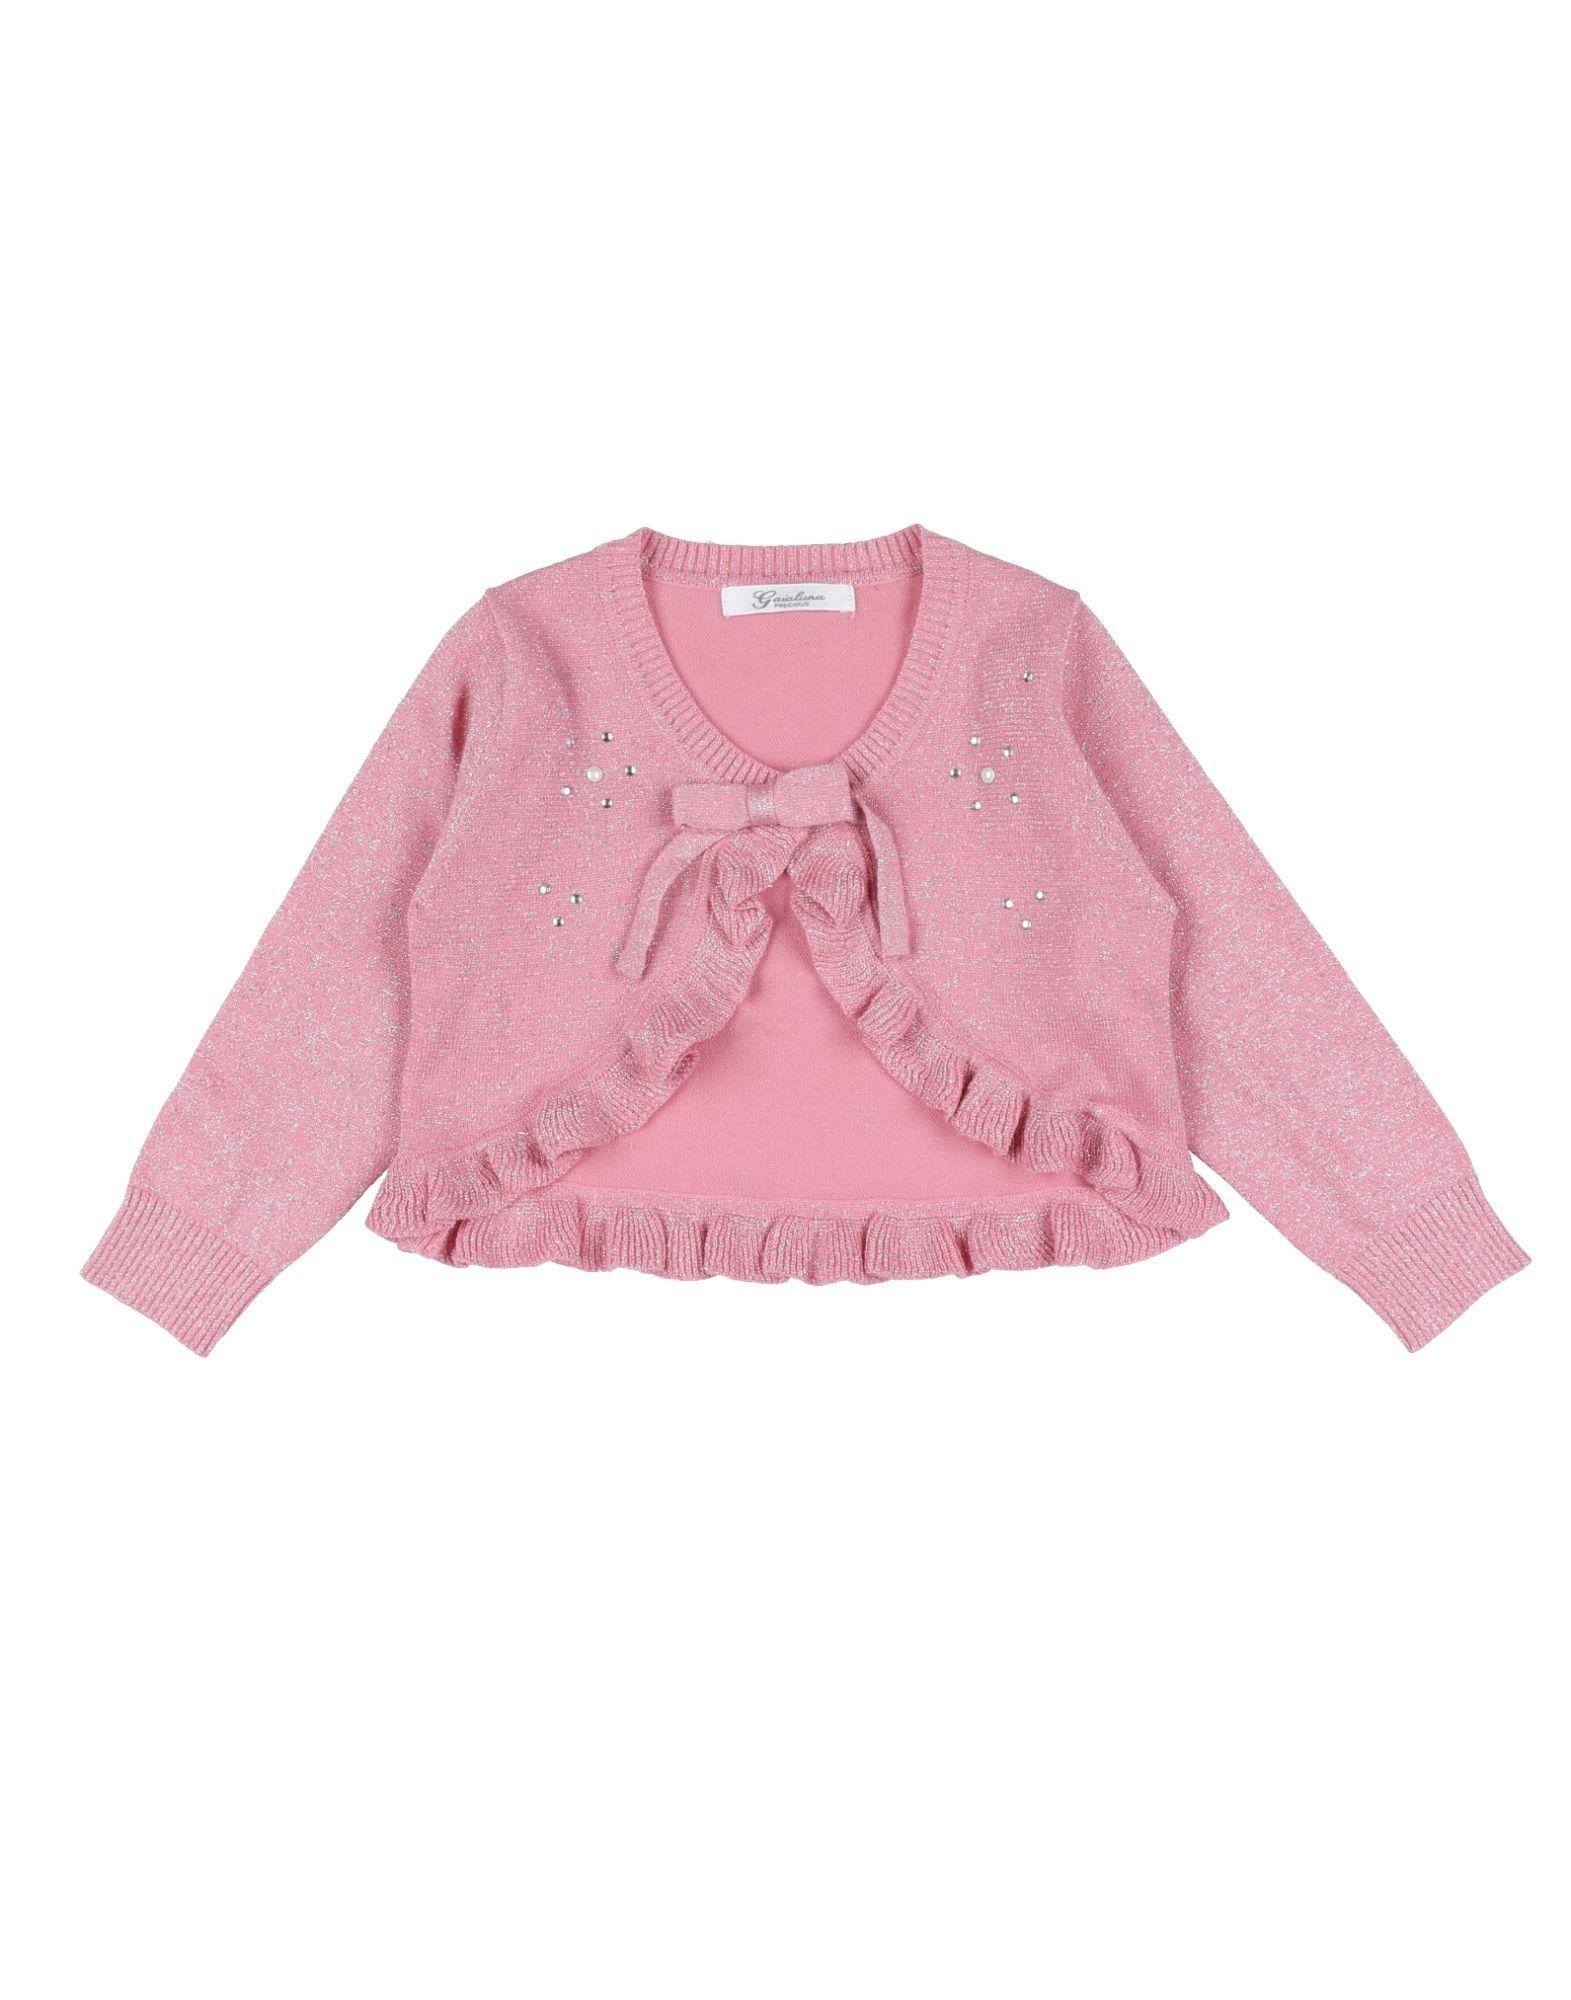 KNITWEAR Gaialuna Pink Girl Cotton